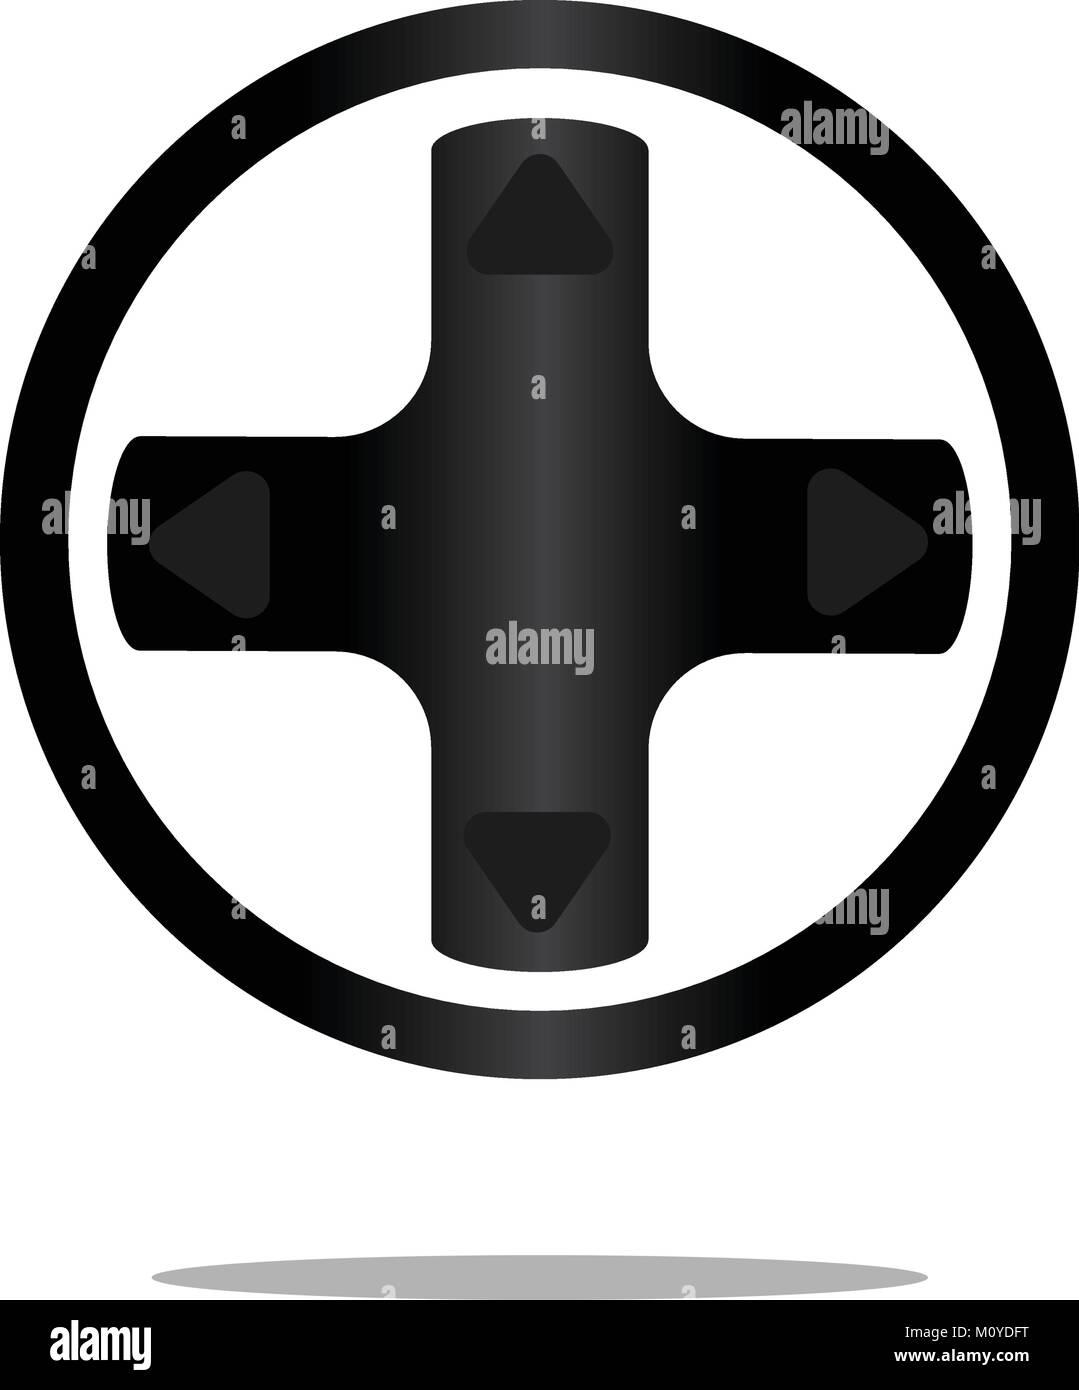 Video games symbol - Stock Image